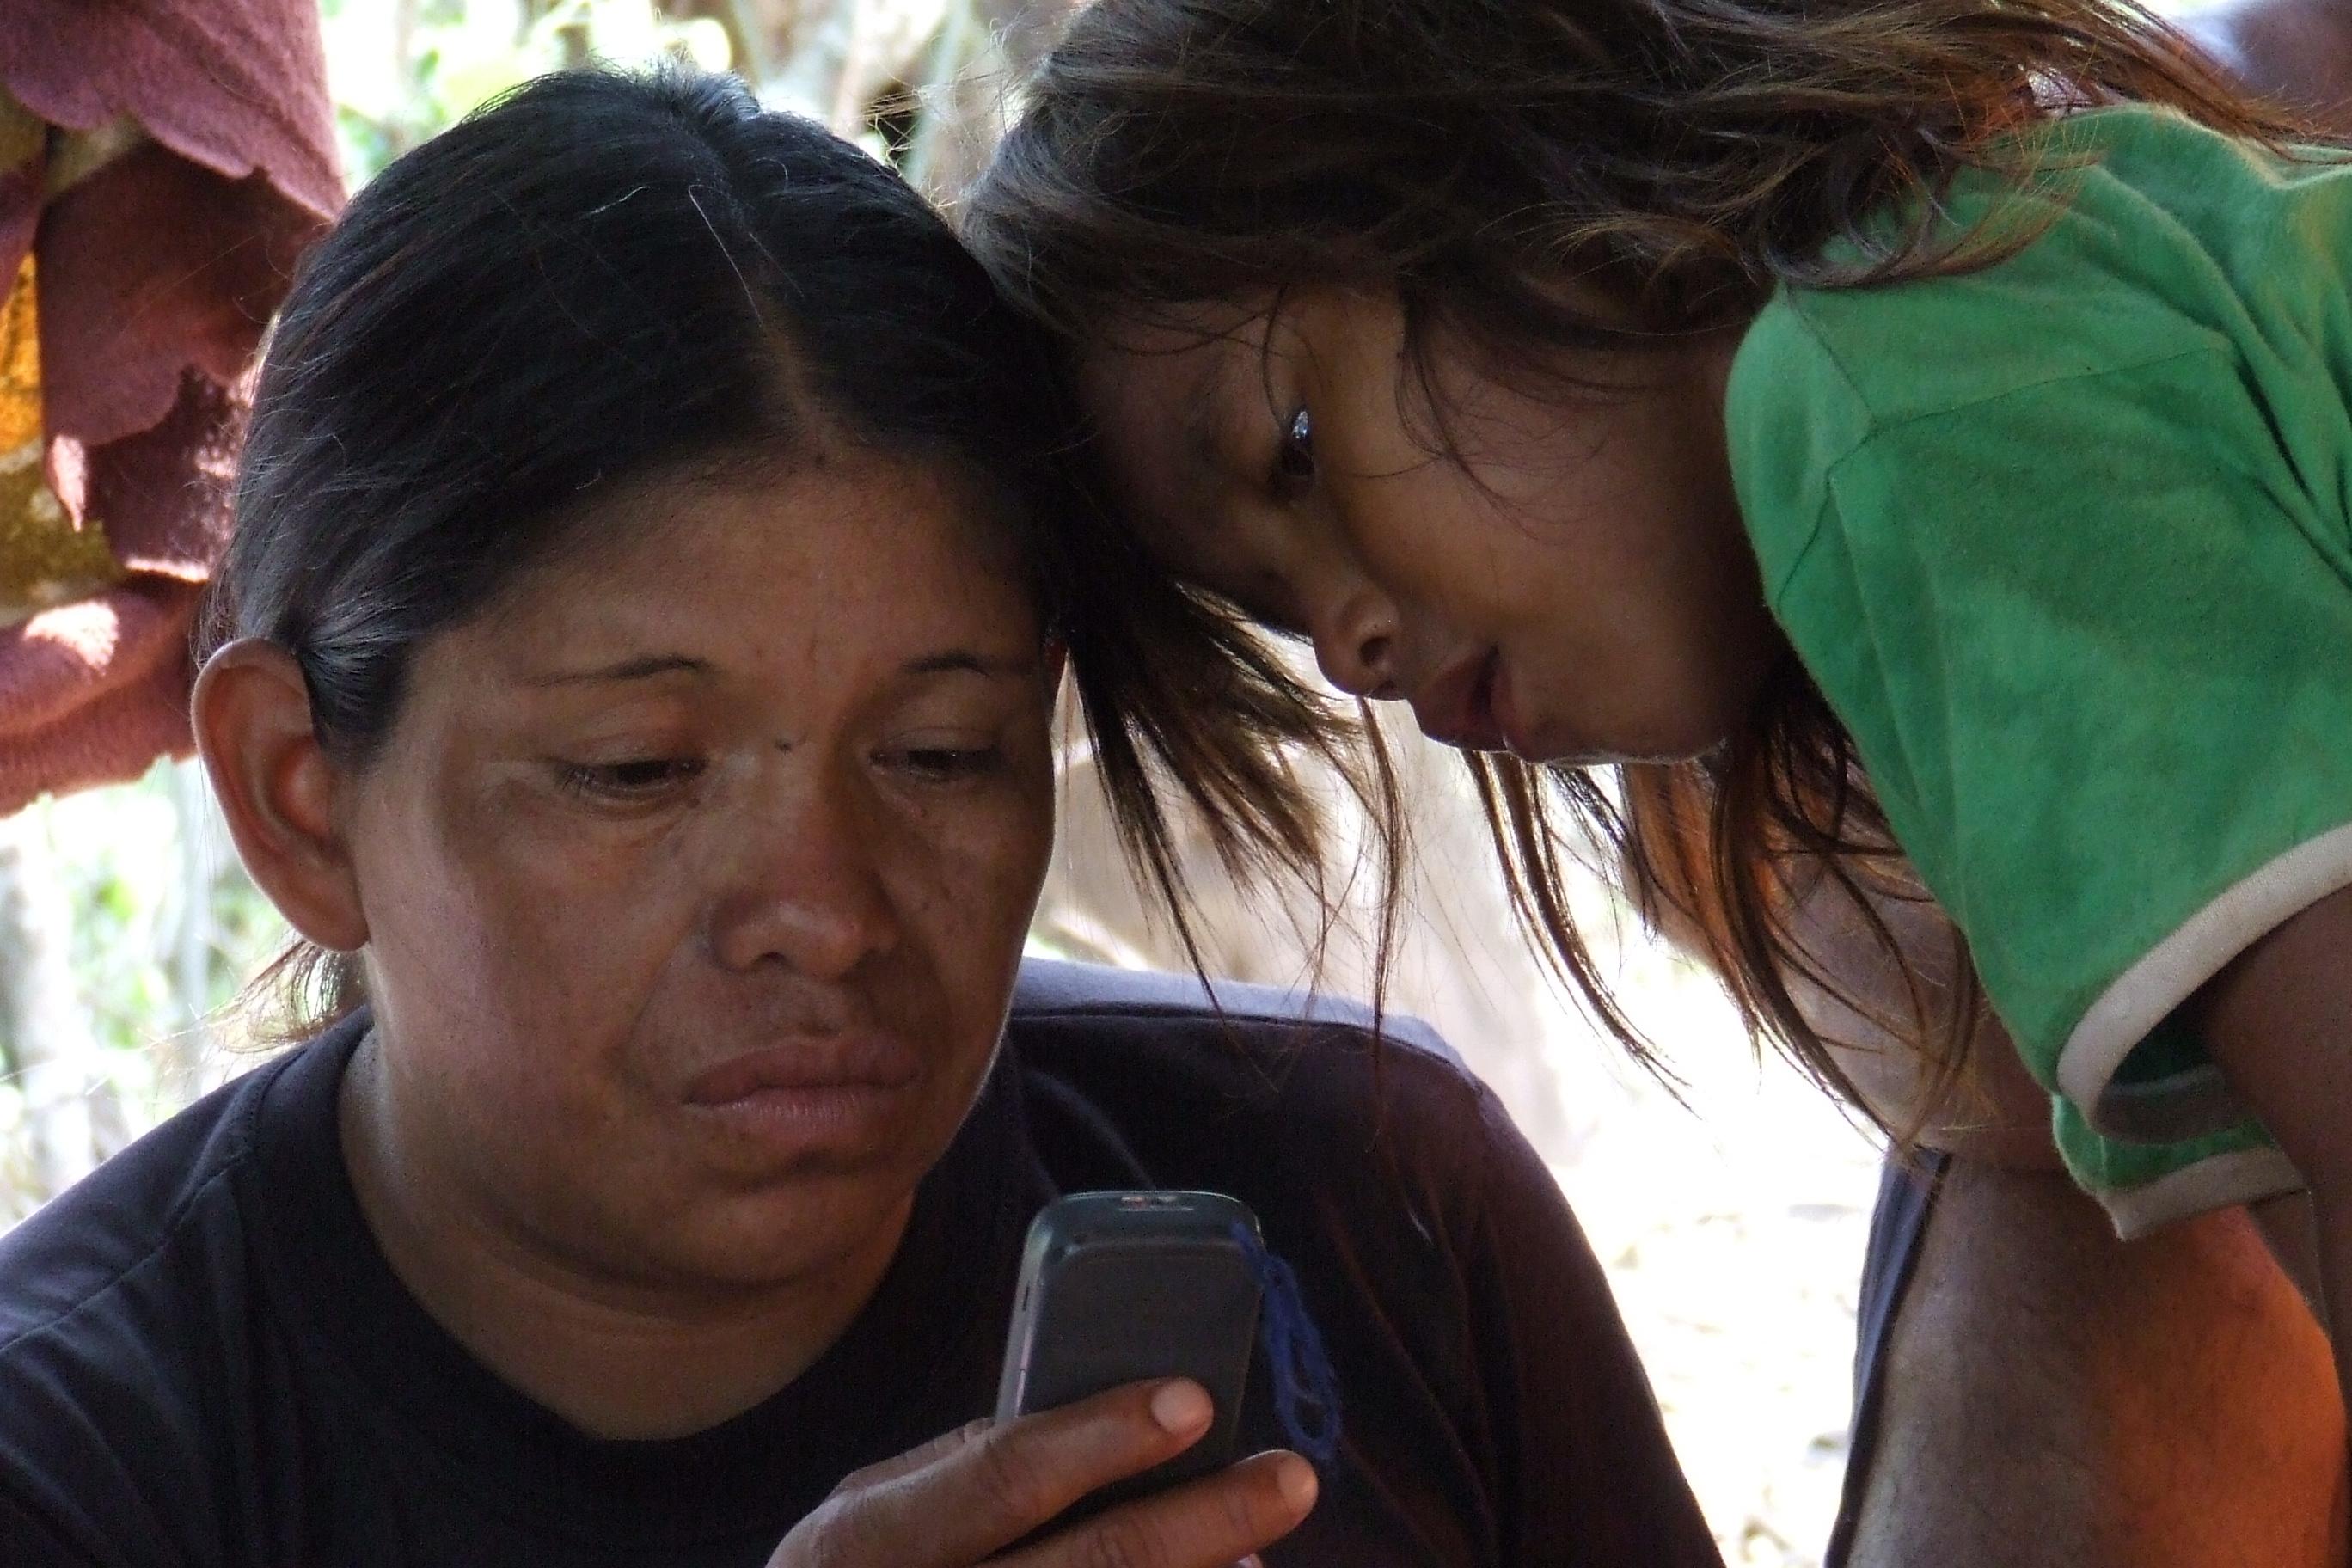 Girl and Woman on Smart Phone